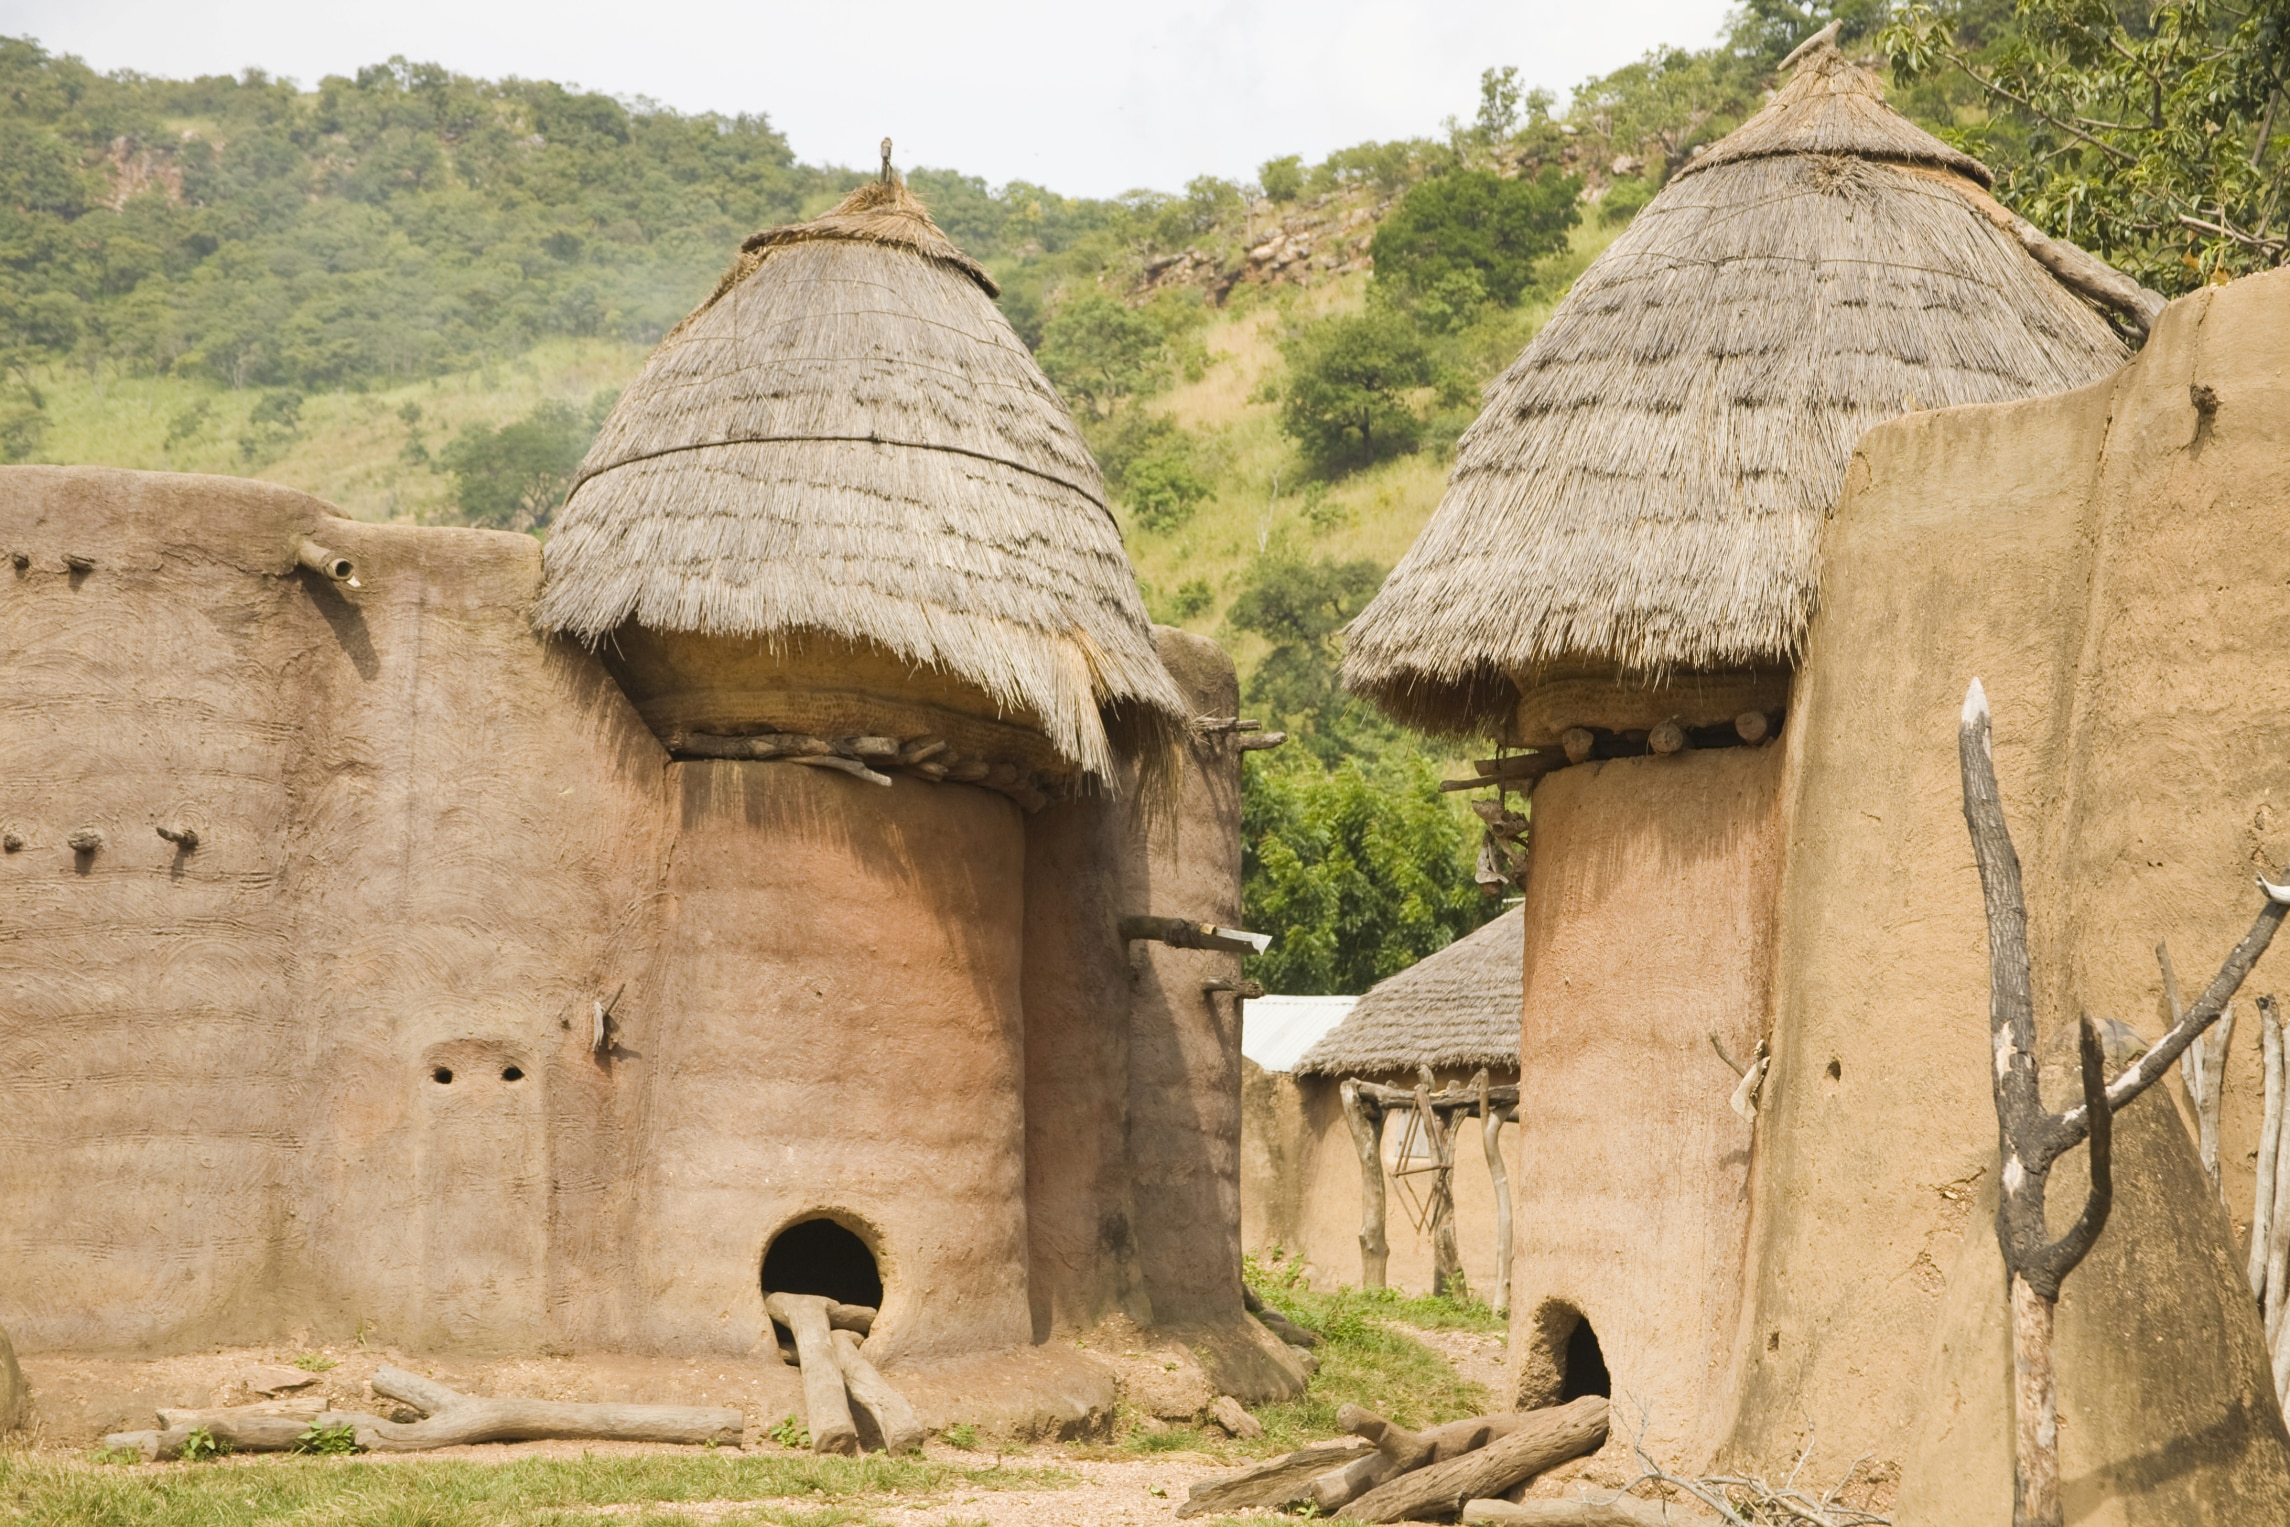 Reisebericht Togo-Benin - Reise Togo